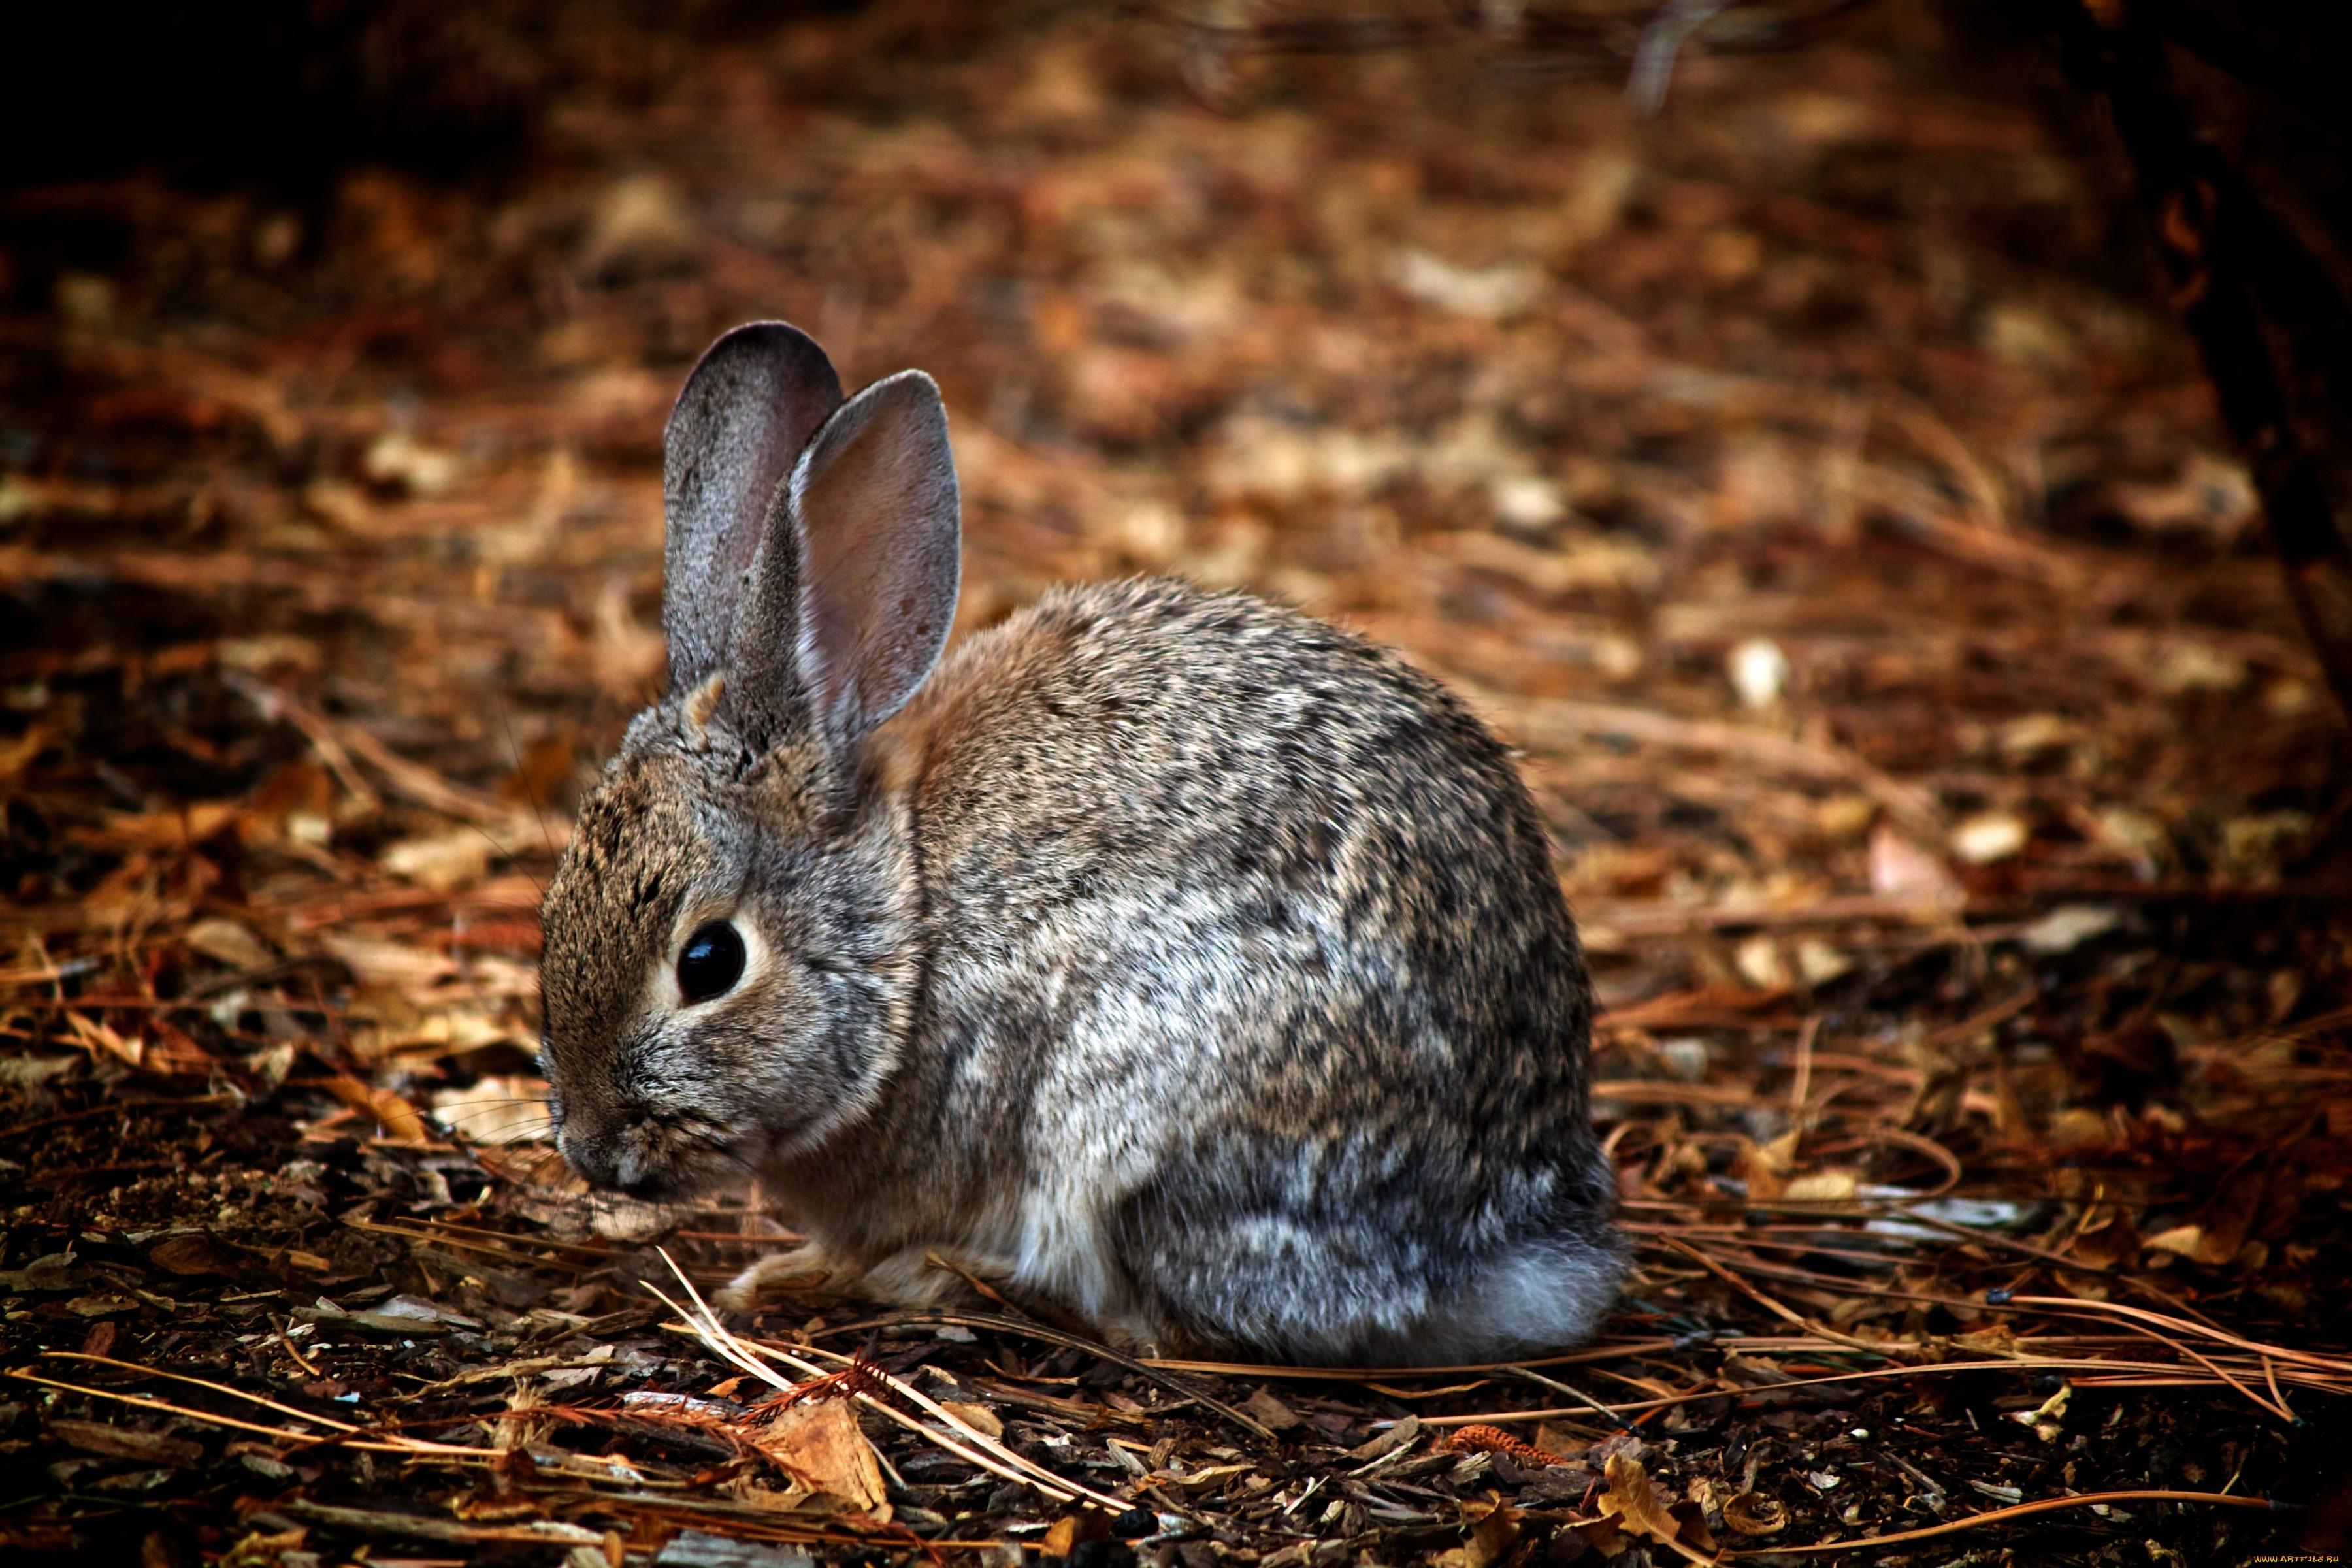 картинка зайца самая лучшая нас разработана